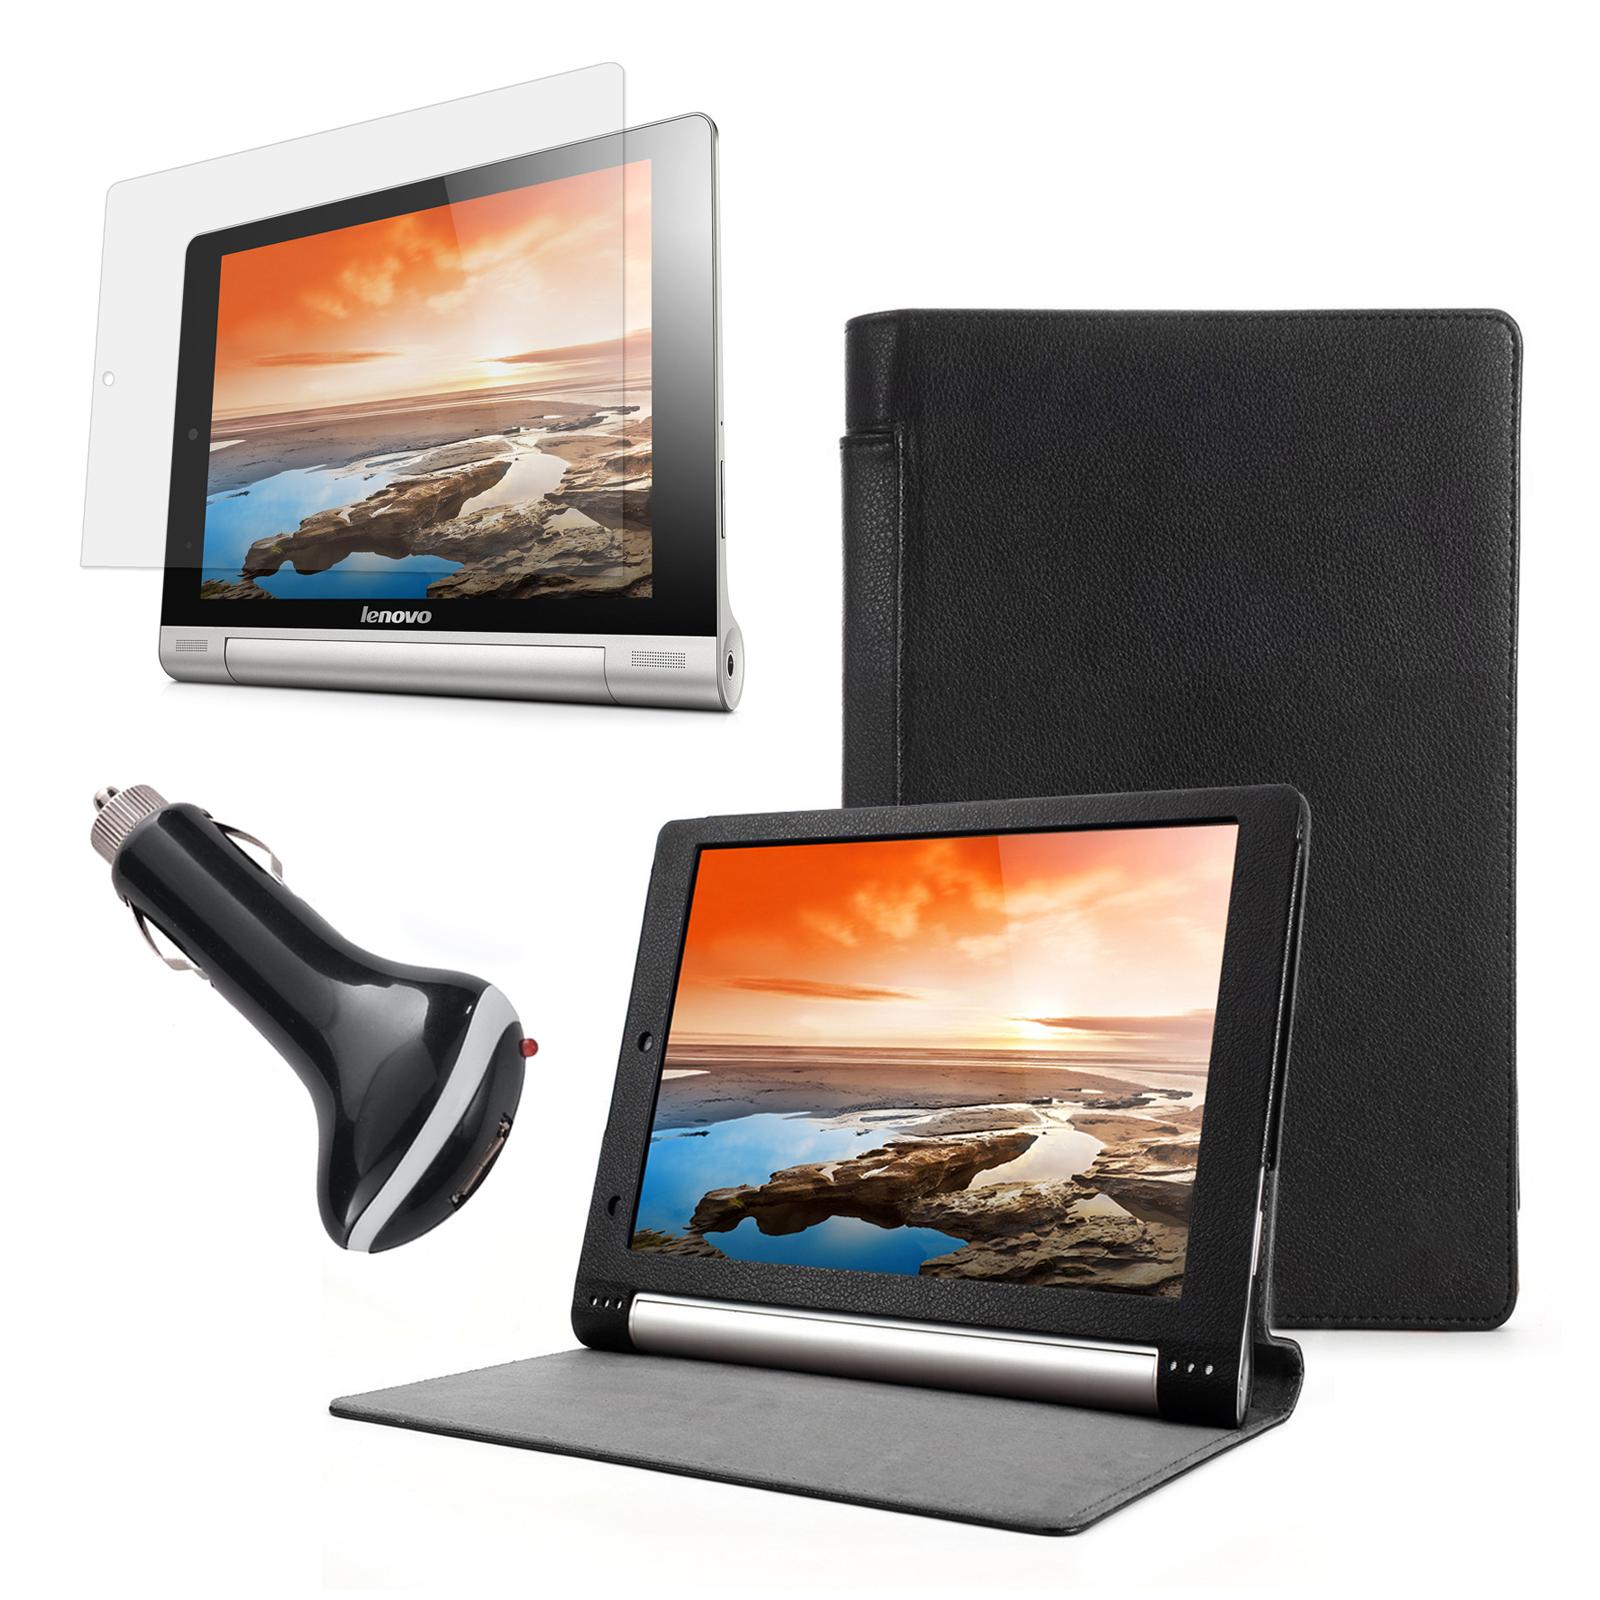 MGear Accessory Bundle for Lenovo Yoga 8 (B6000)